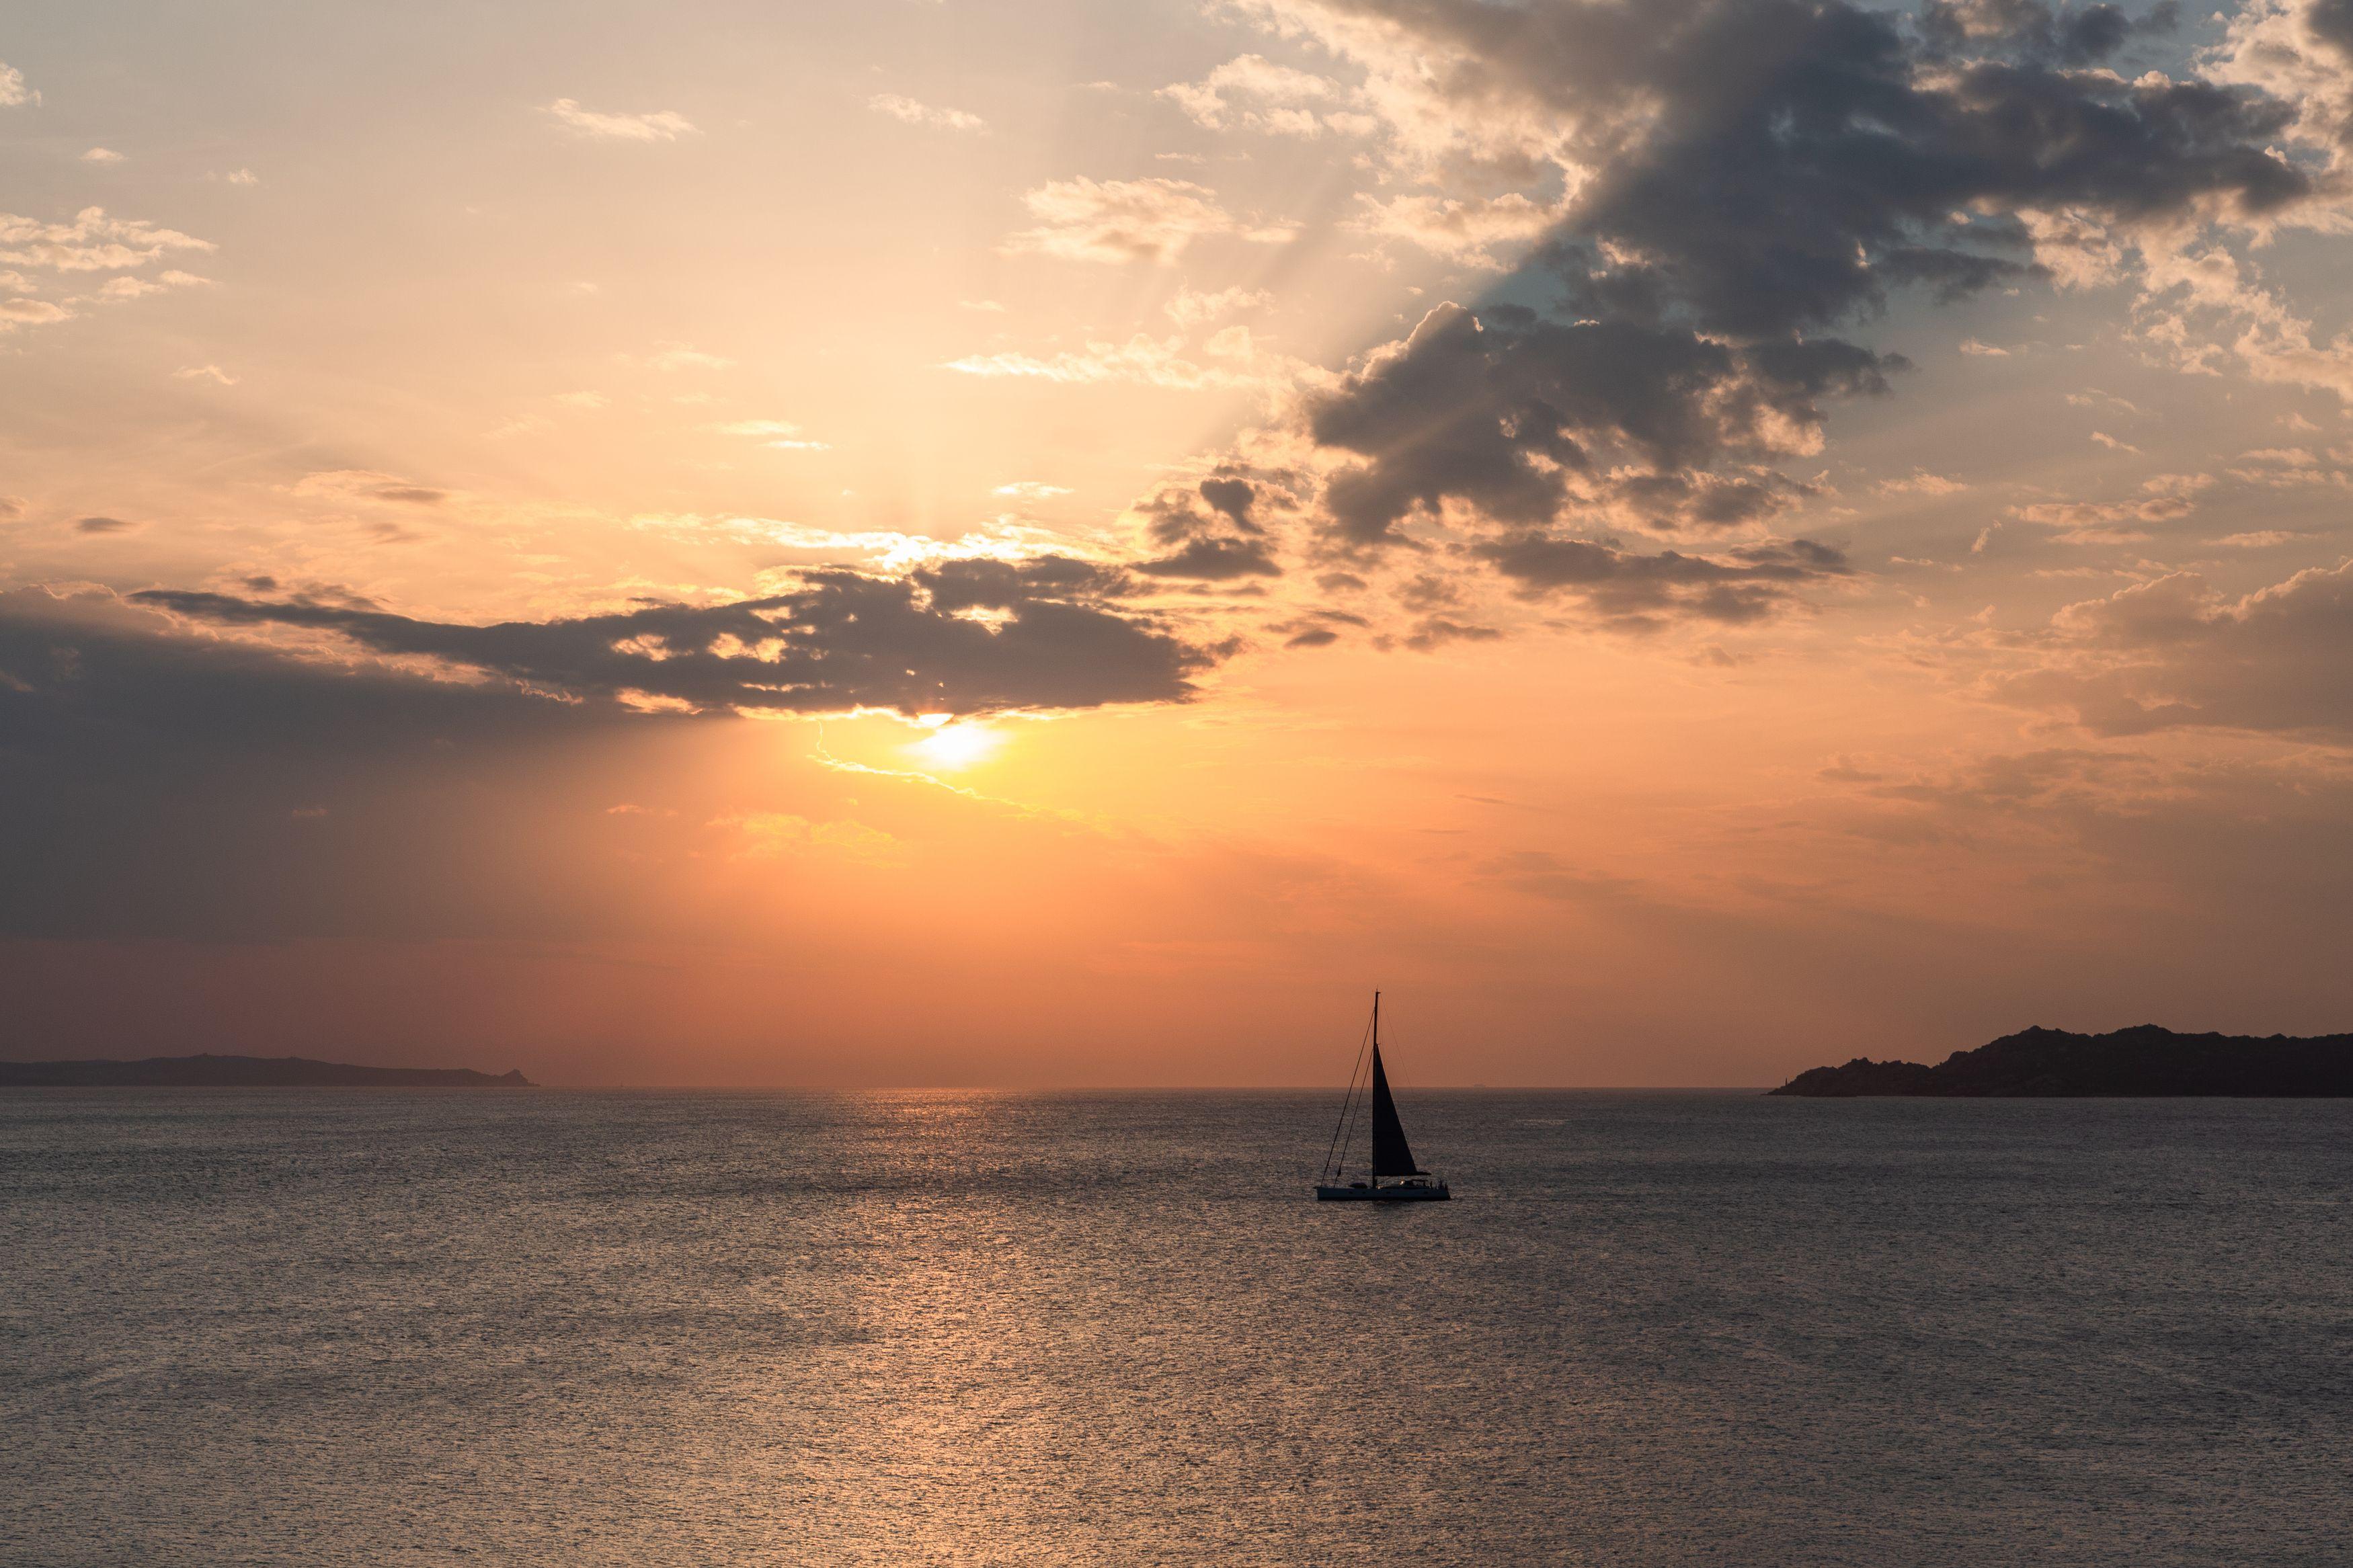 sardegna,italy,mediterranean,sailing,sunset,sardinia,, Zilbalodis Eriks